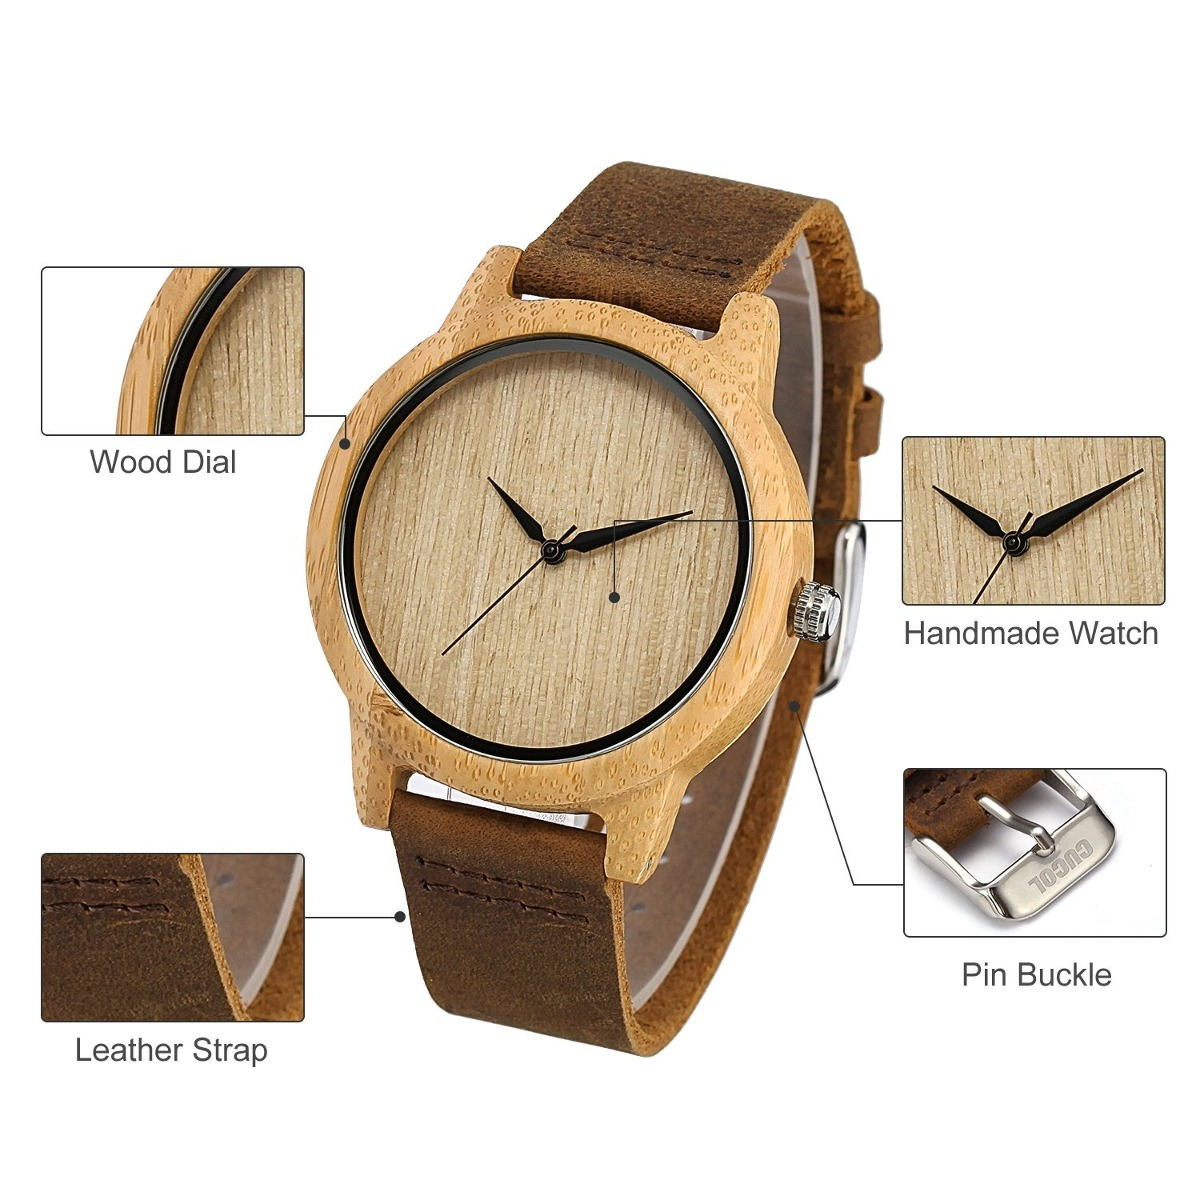 a8862598fe29 cucol relojes de madera de bambú para hombres minimalismo. Cargando zoom.